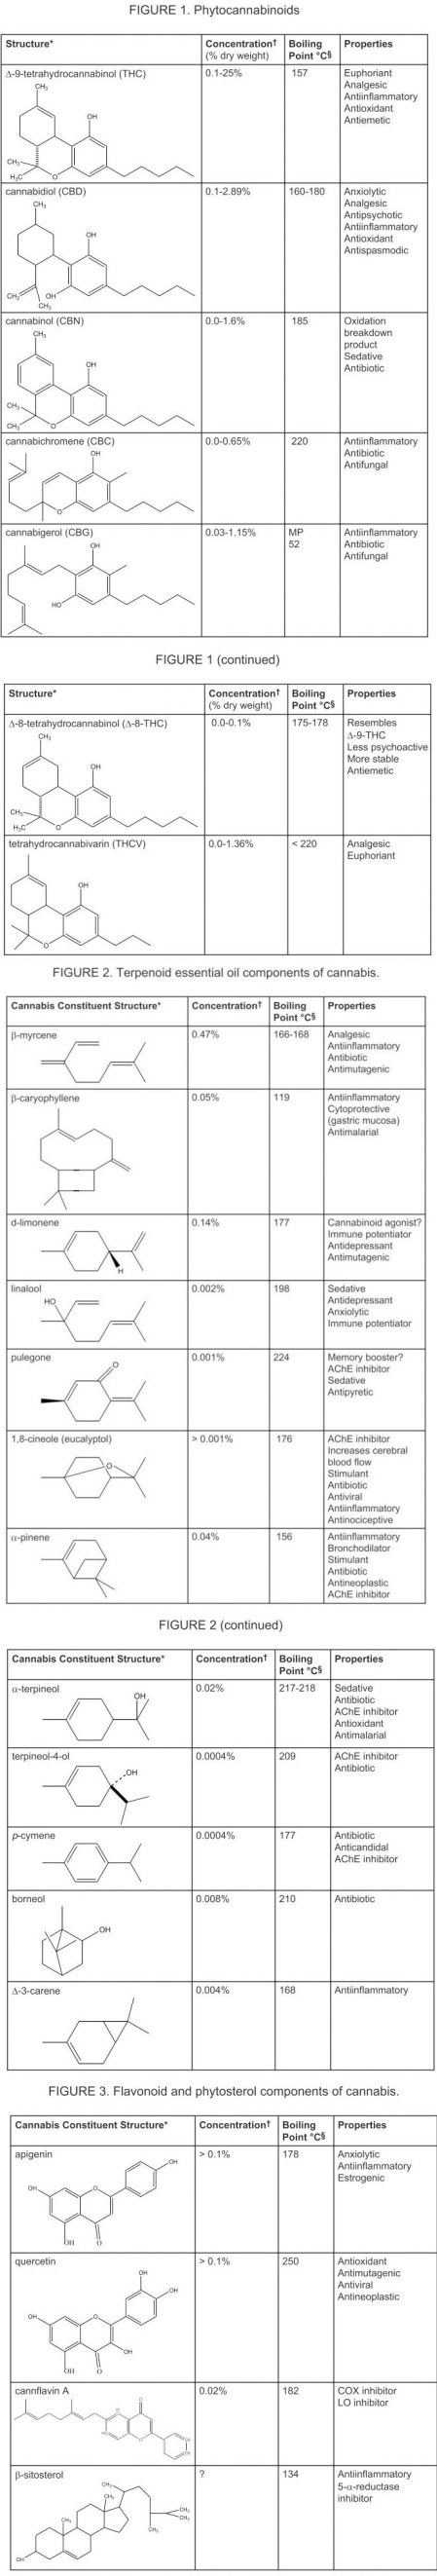 cannabinoids21chart1.jpg?w=450&h=2645